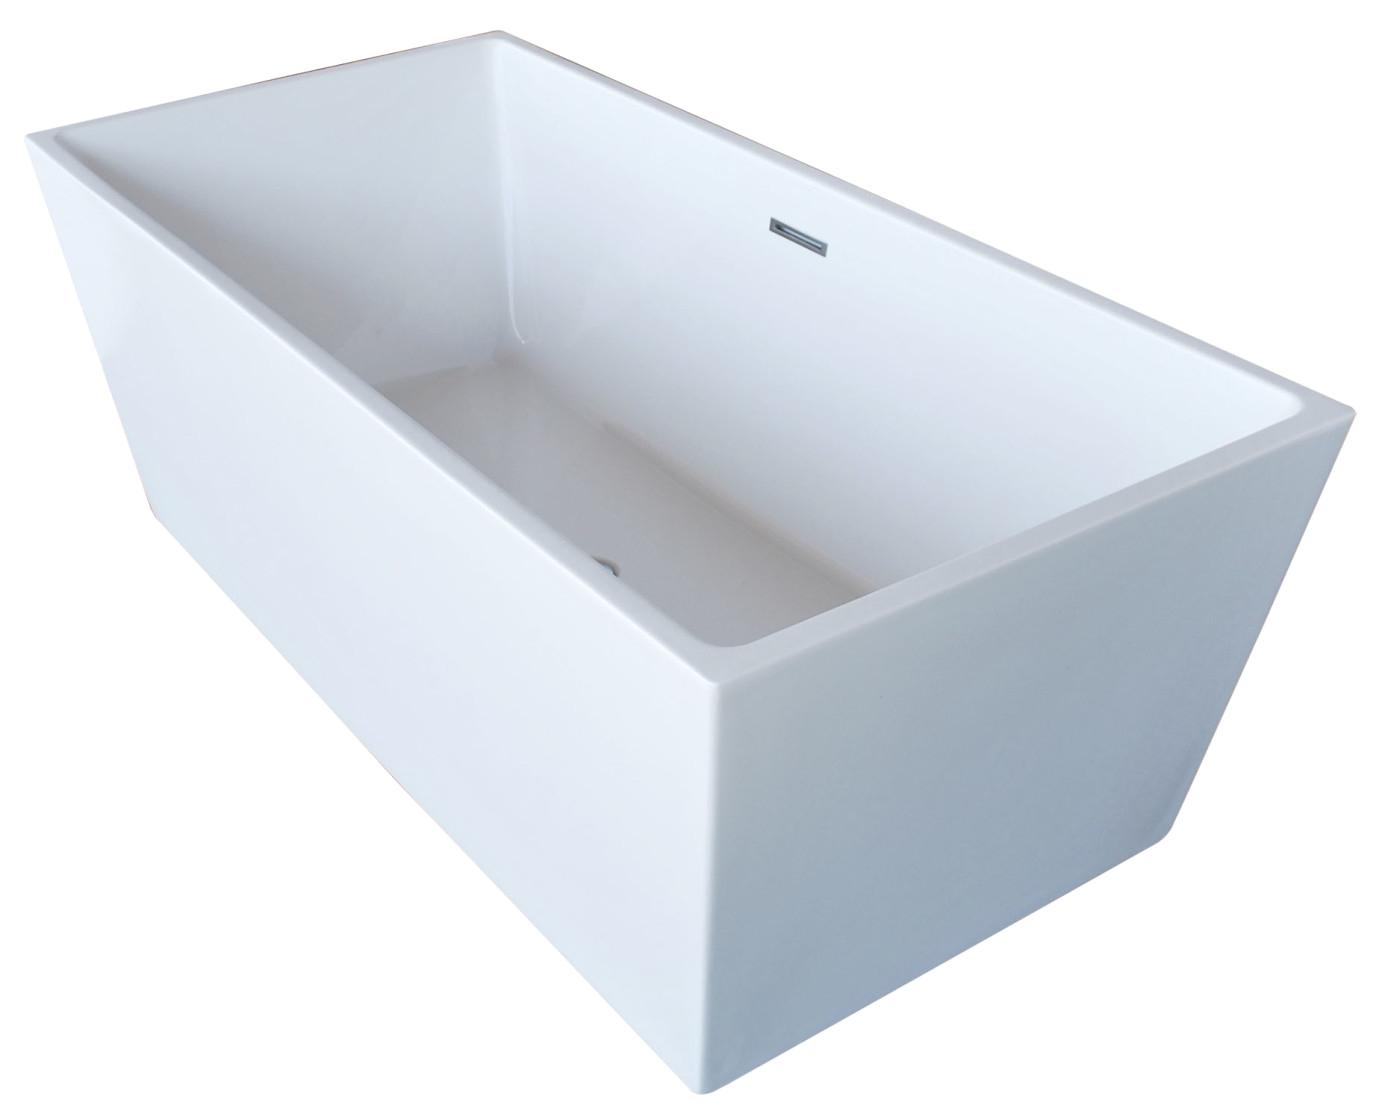 48 Bathtub Center Drain Fjord 5 6 Ft Acrylic Center Drain Freestanding Bathtub In